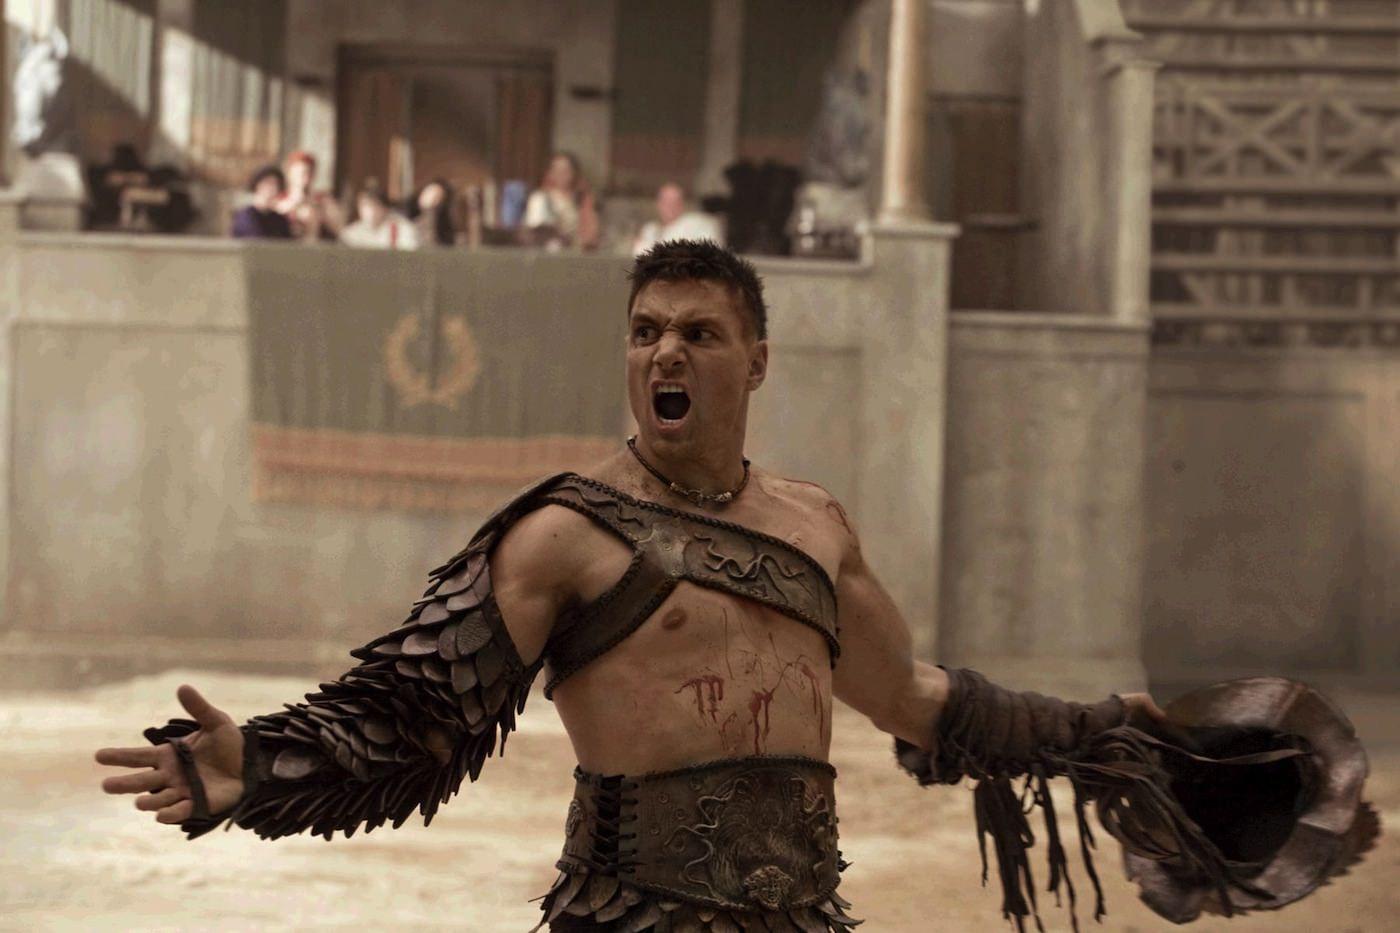 Spartacus manu bennett